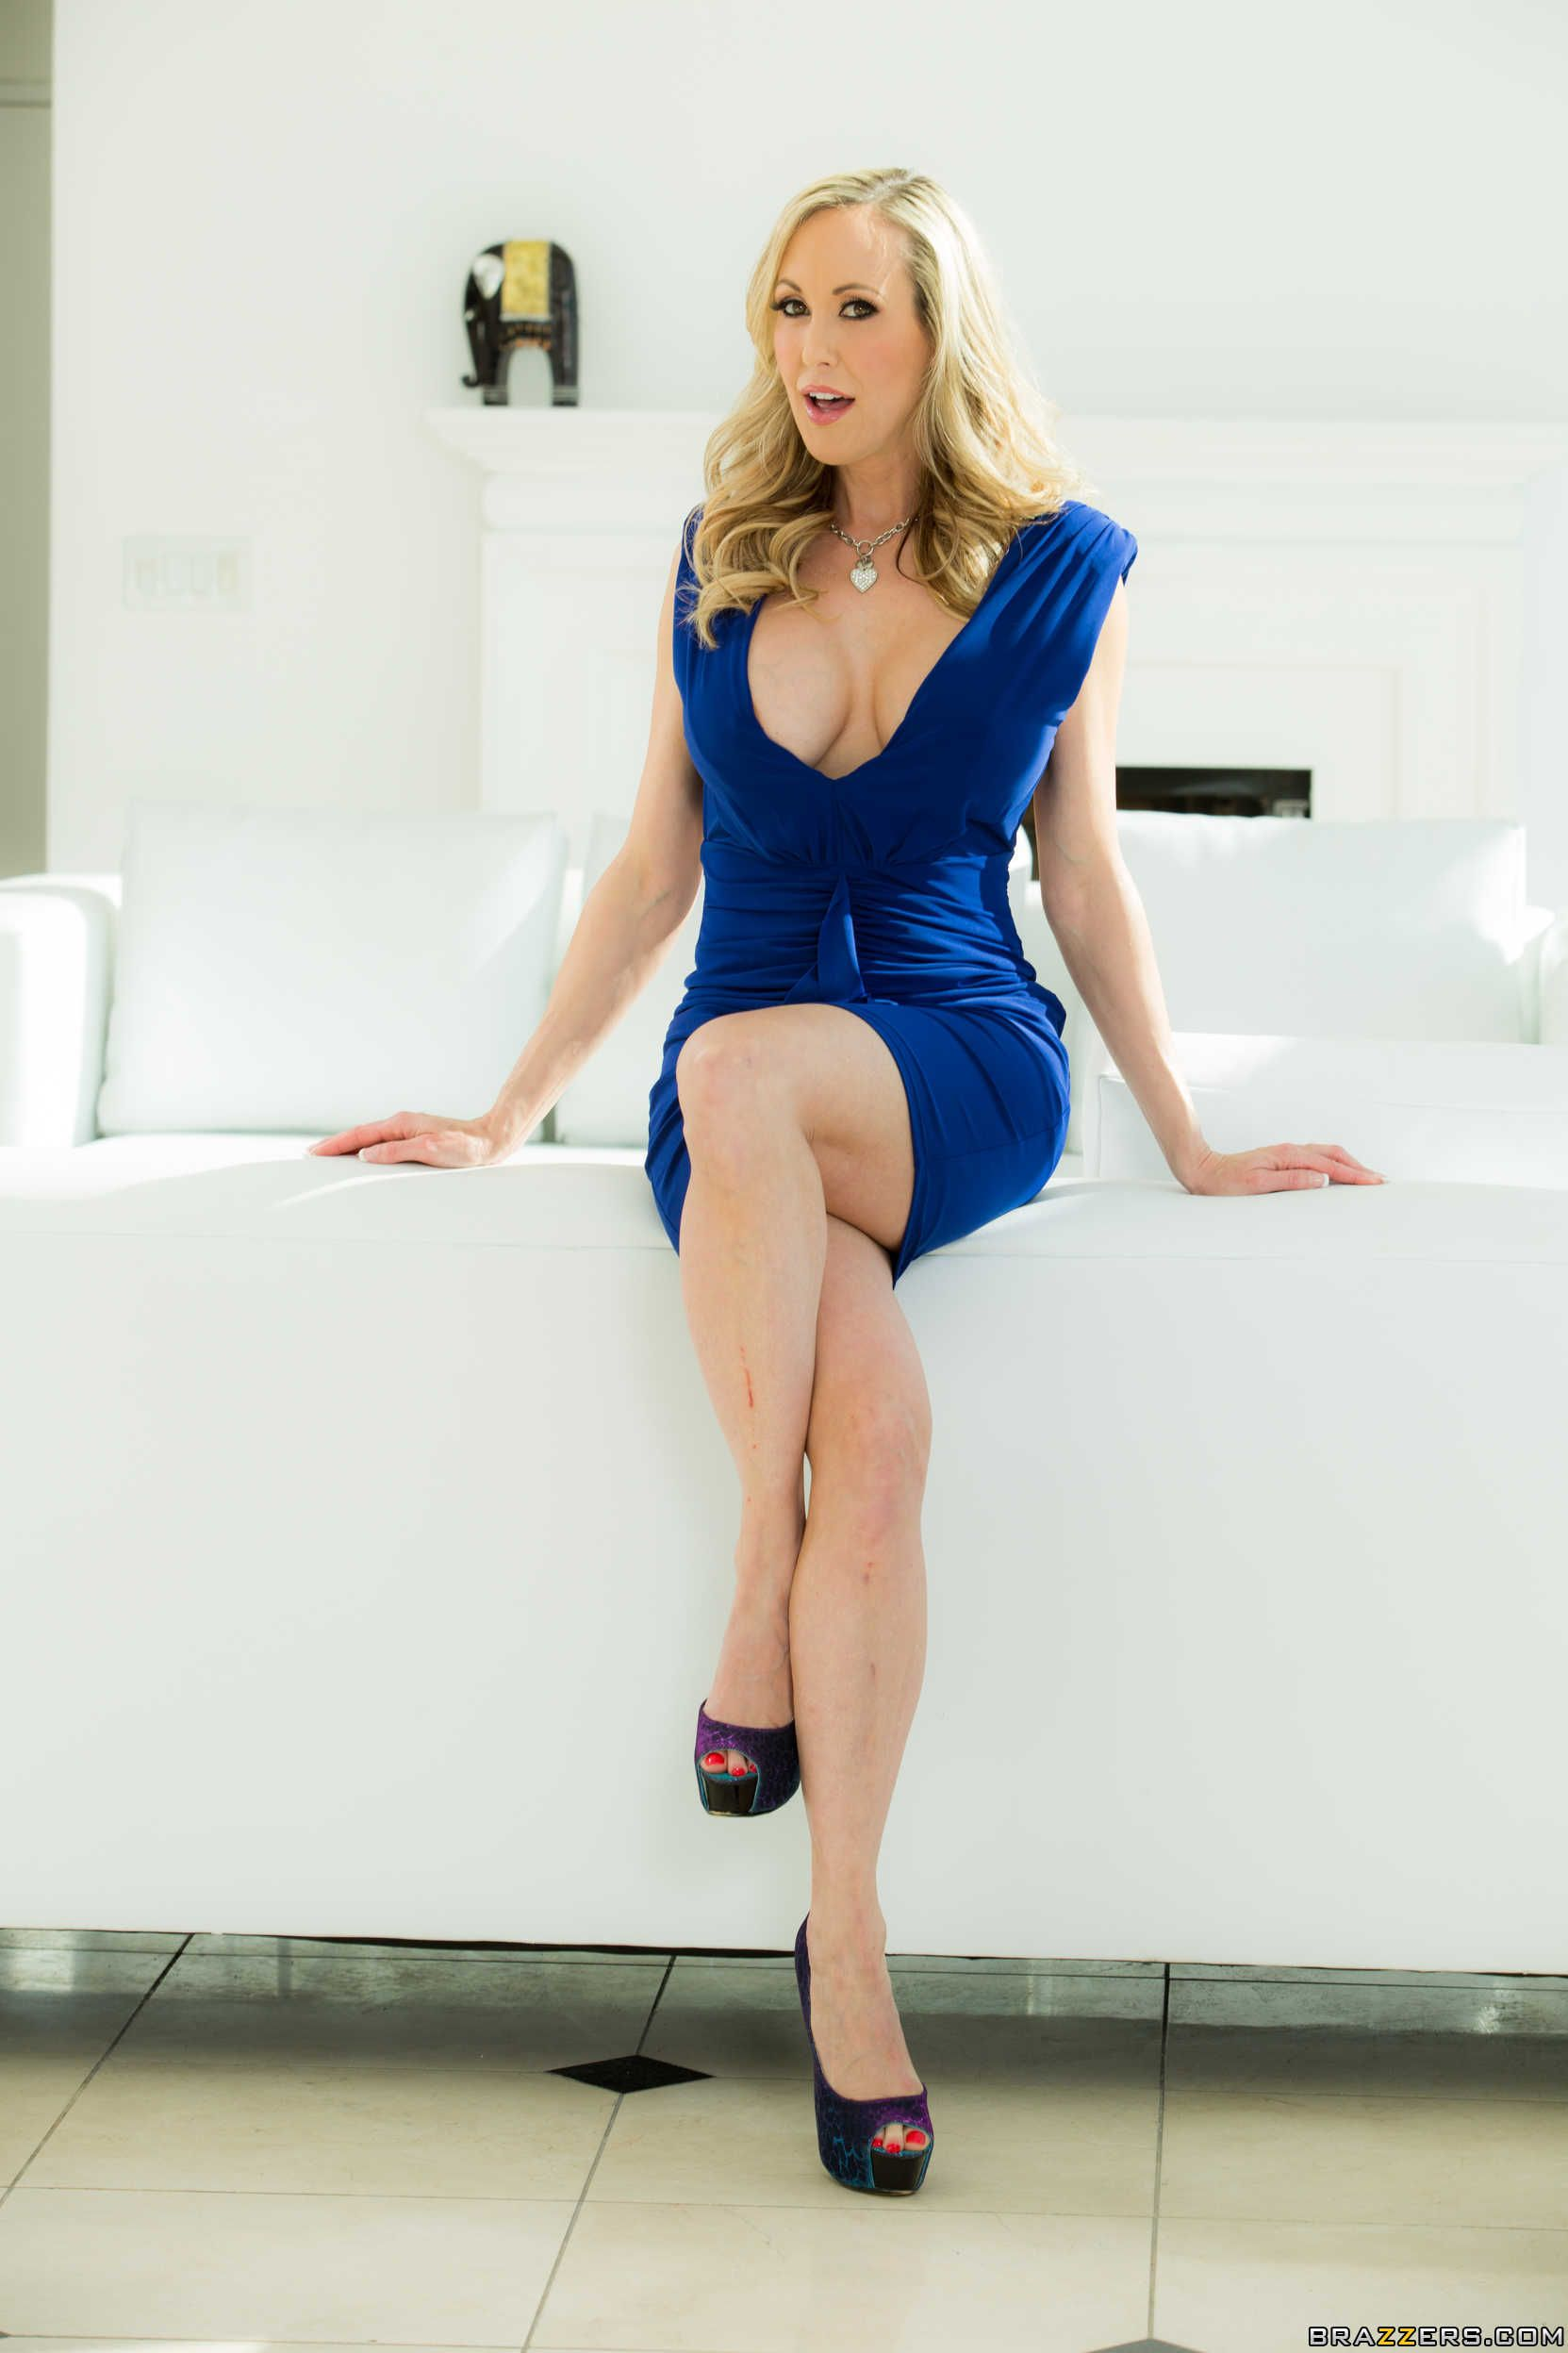 Naked big booty girls high heels